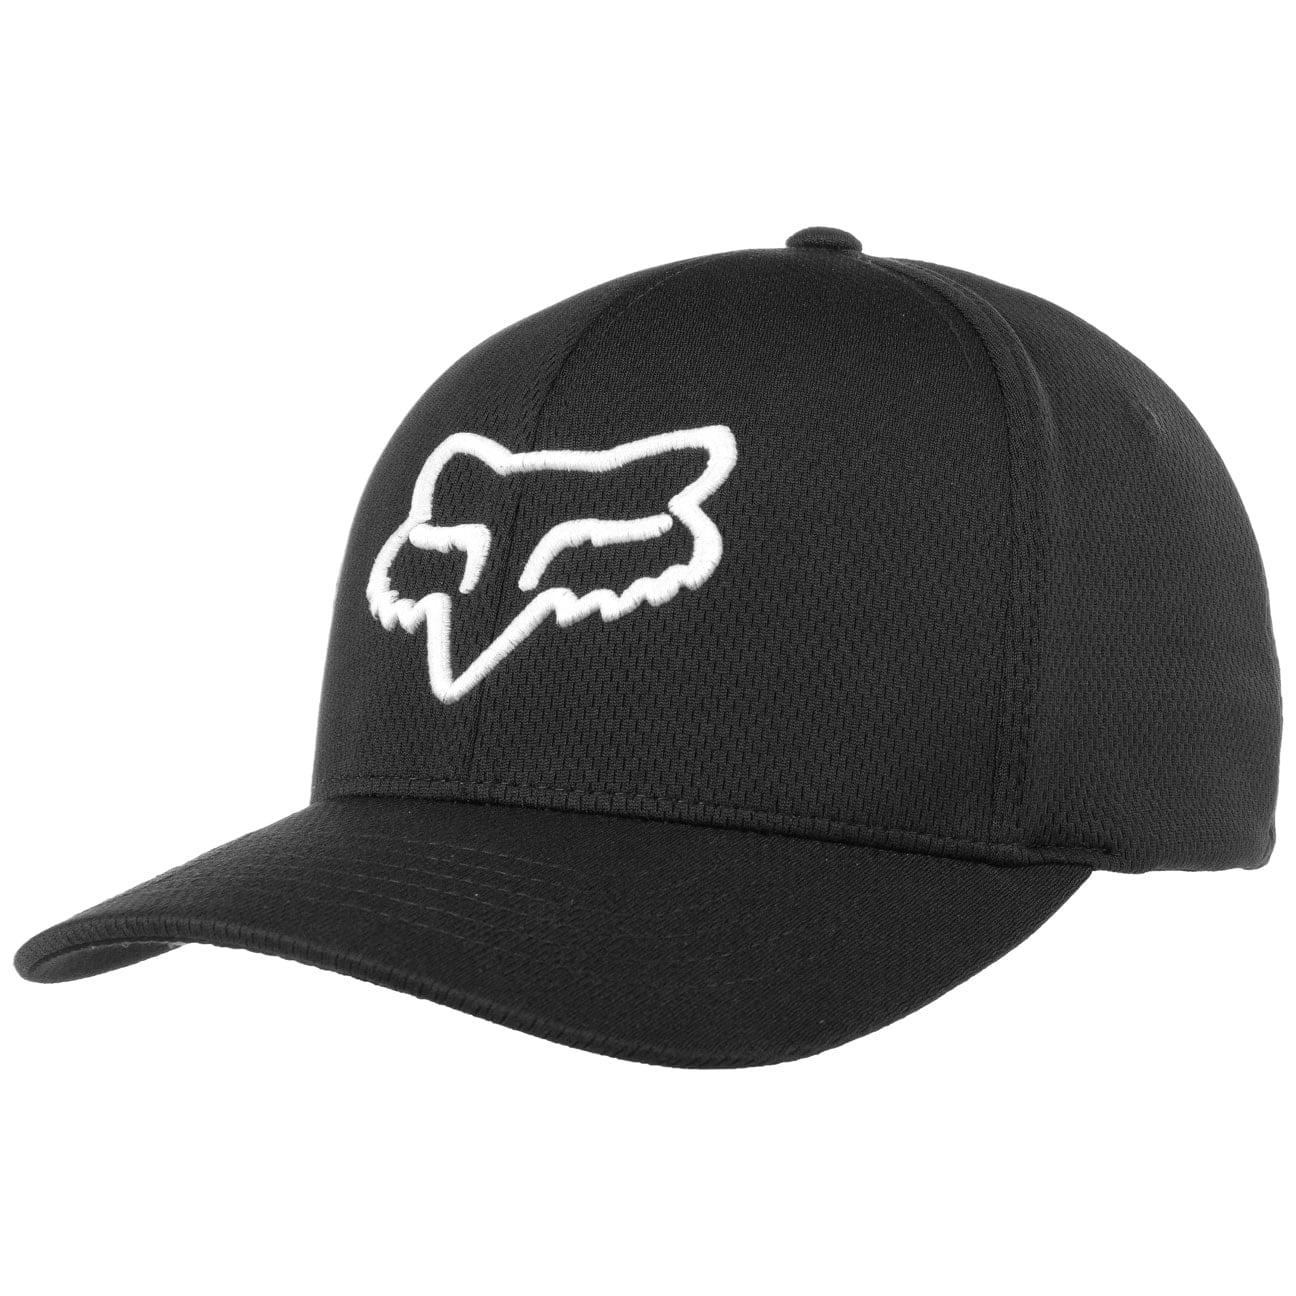 lithotype-flexfit-cap-by-fox-basecap